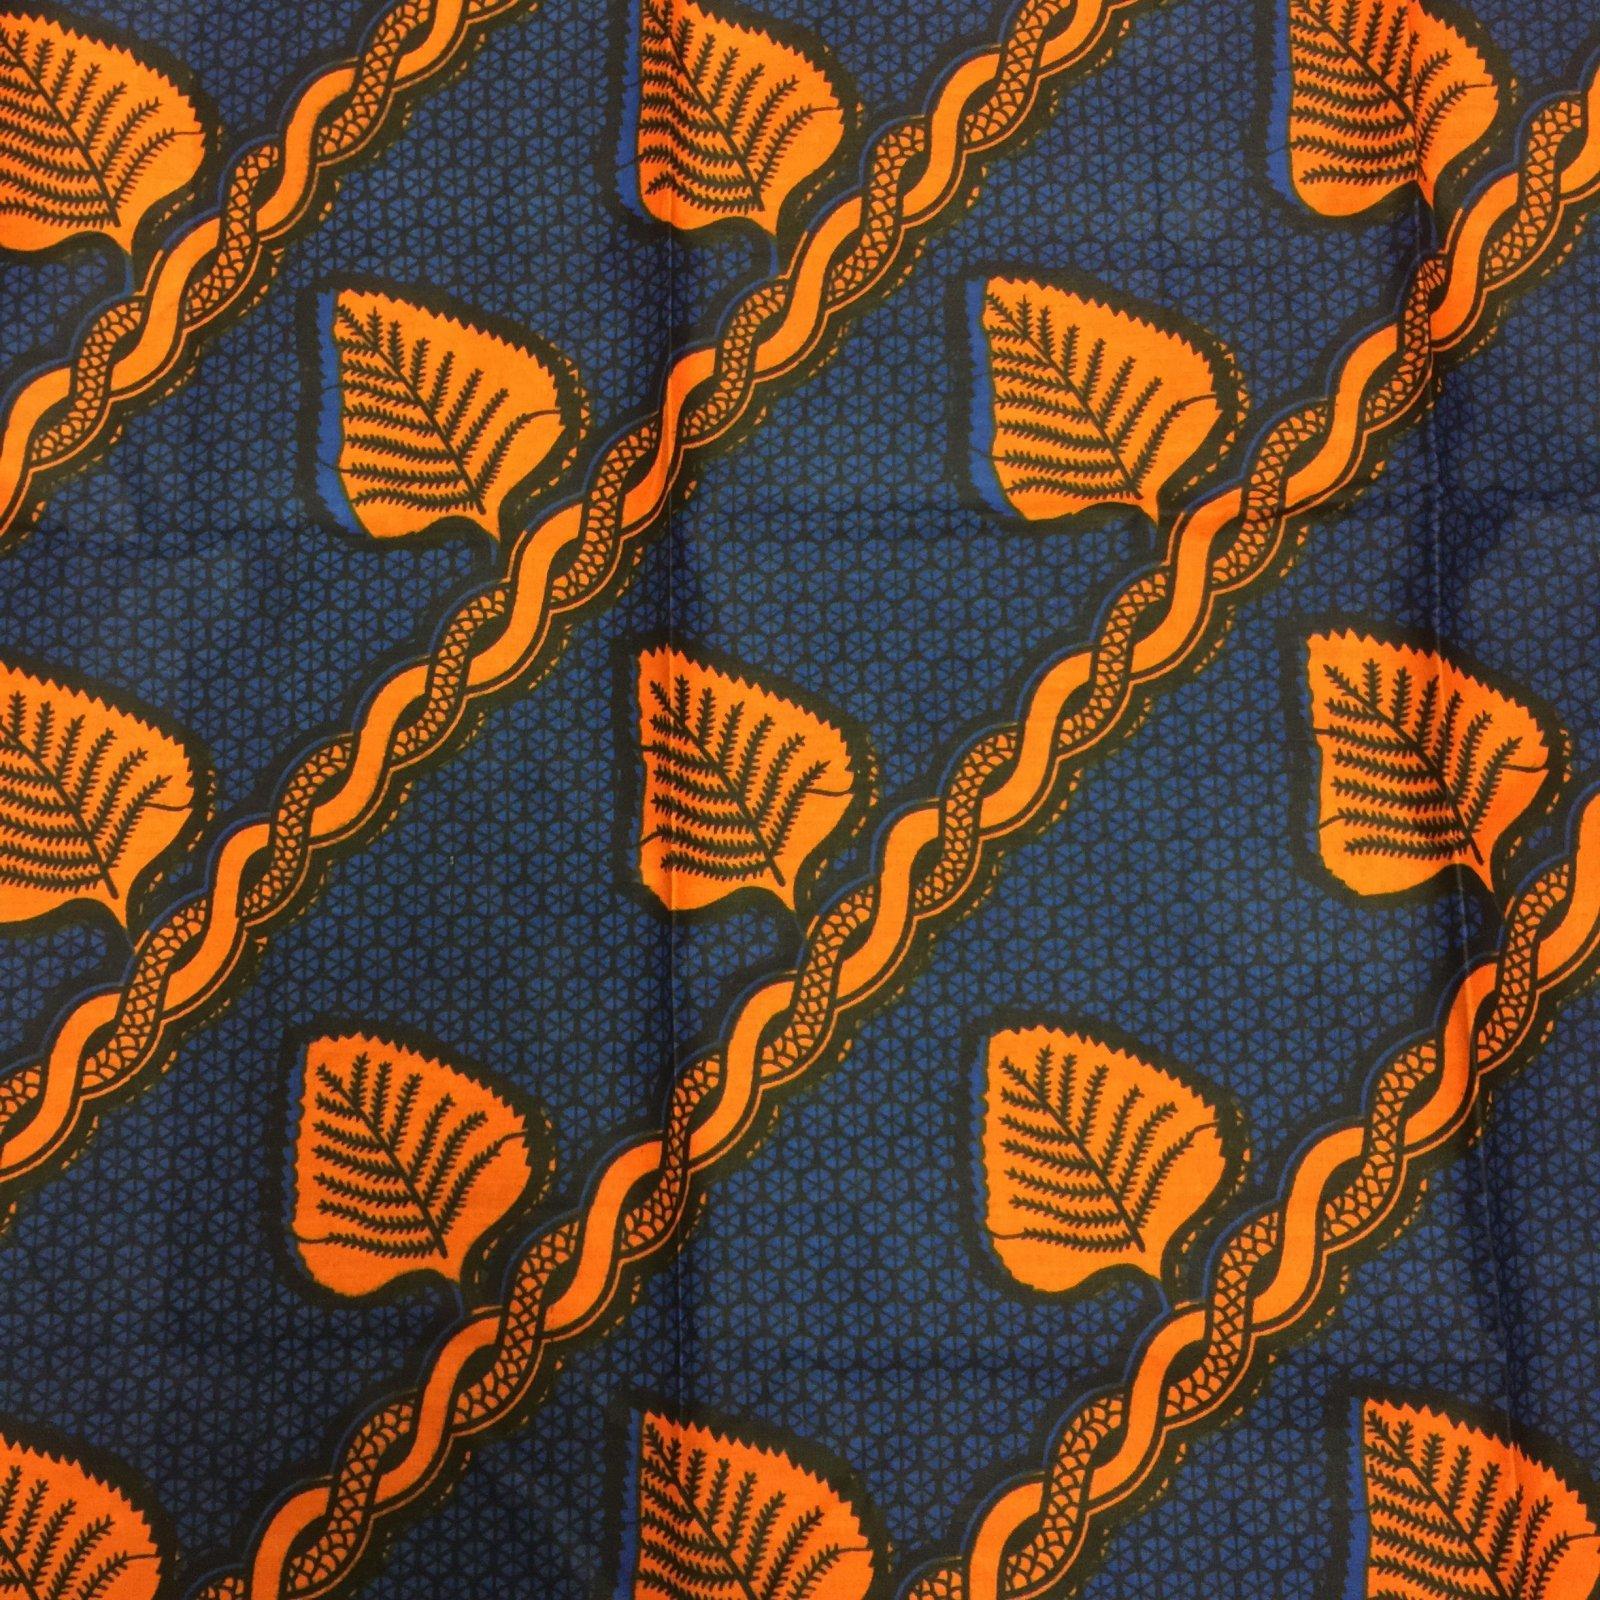 W67 wax print Yara African Fabrics